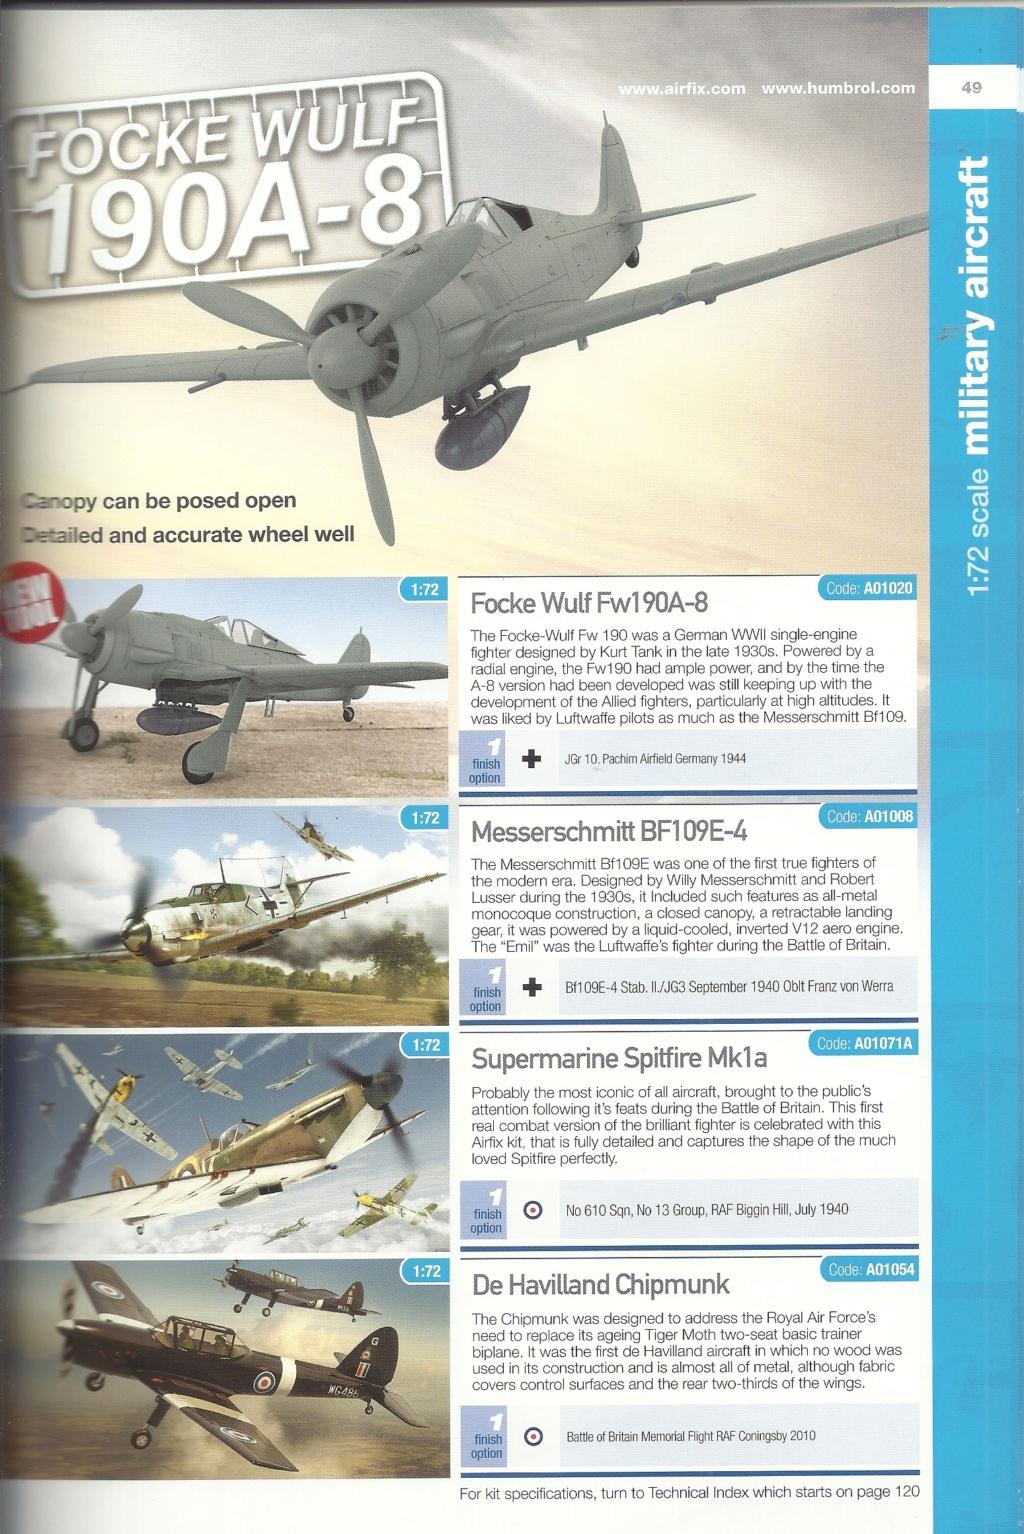 [AIRFIX 2013] Catalogue 2013 Airf1502